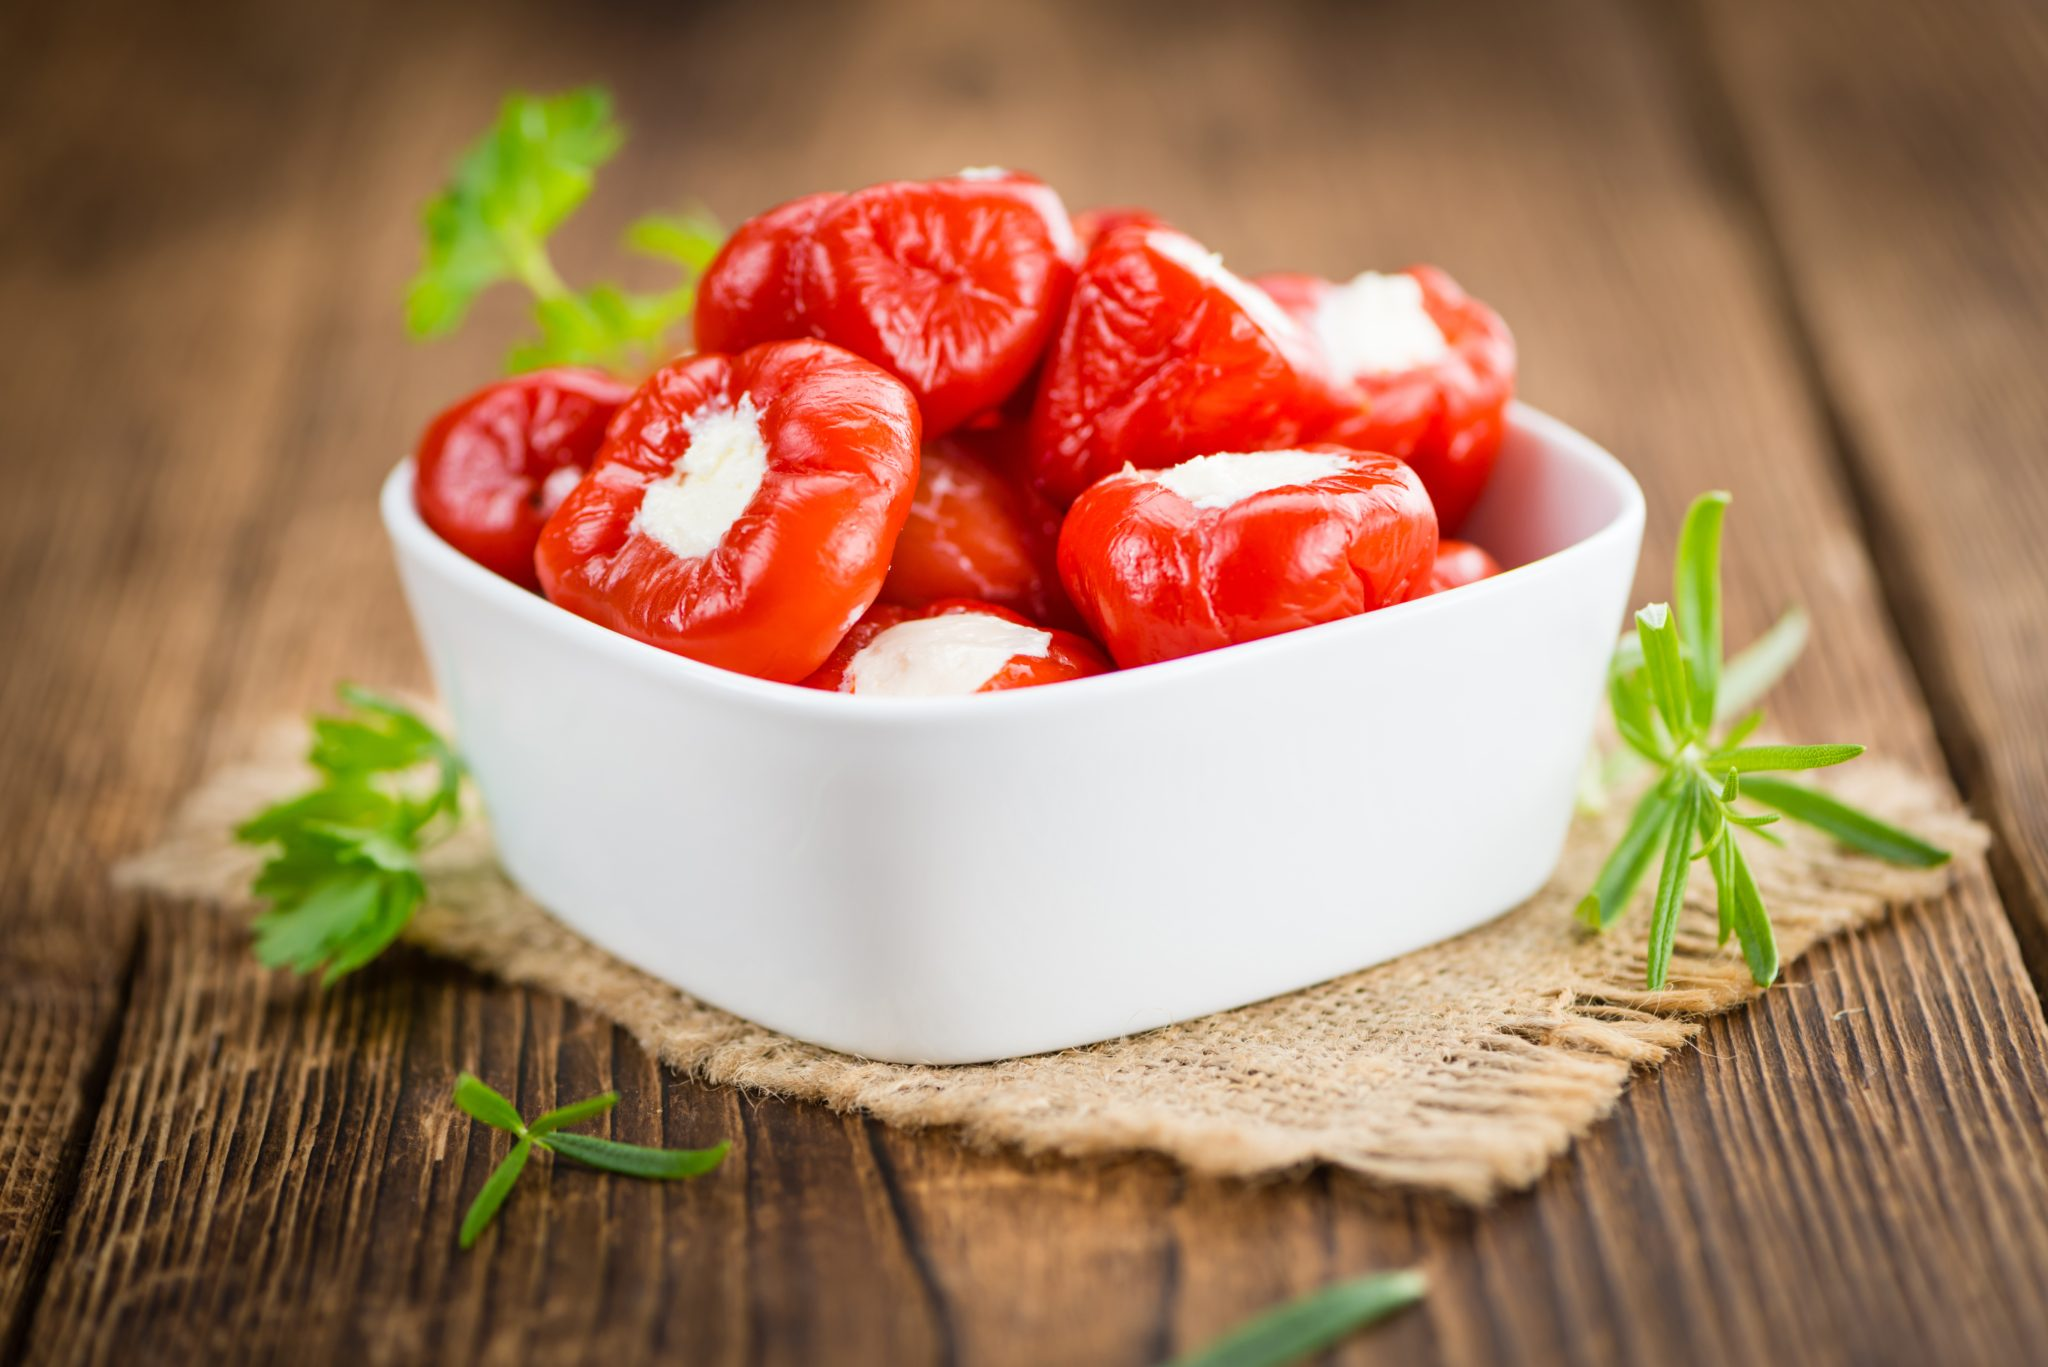 Vegetarian Roasted Ricotta Stuffed Peppers Recipe